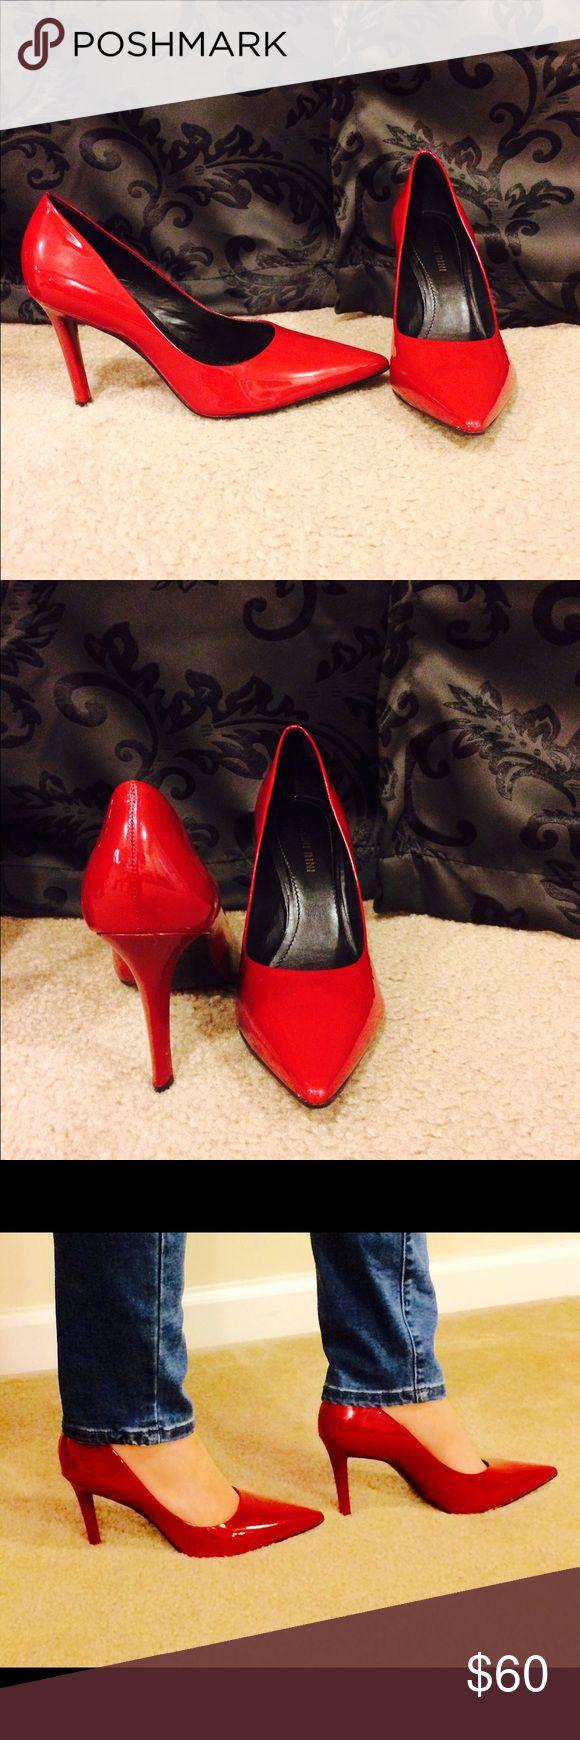 Gianni Bini Patent Leather Red Heels (size 8) Gianni Bini Patent Leather Red Heels (size 8). Originally $80. Gianni Bini Shoes Heels